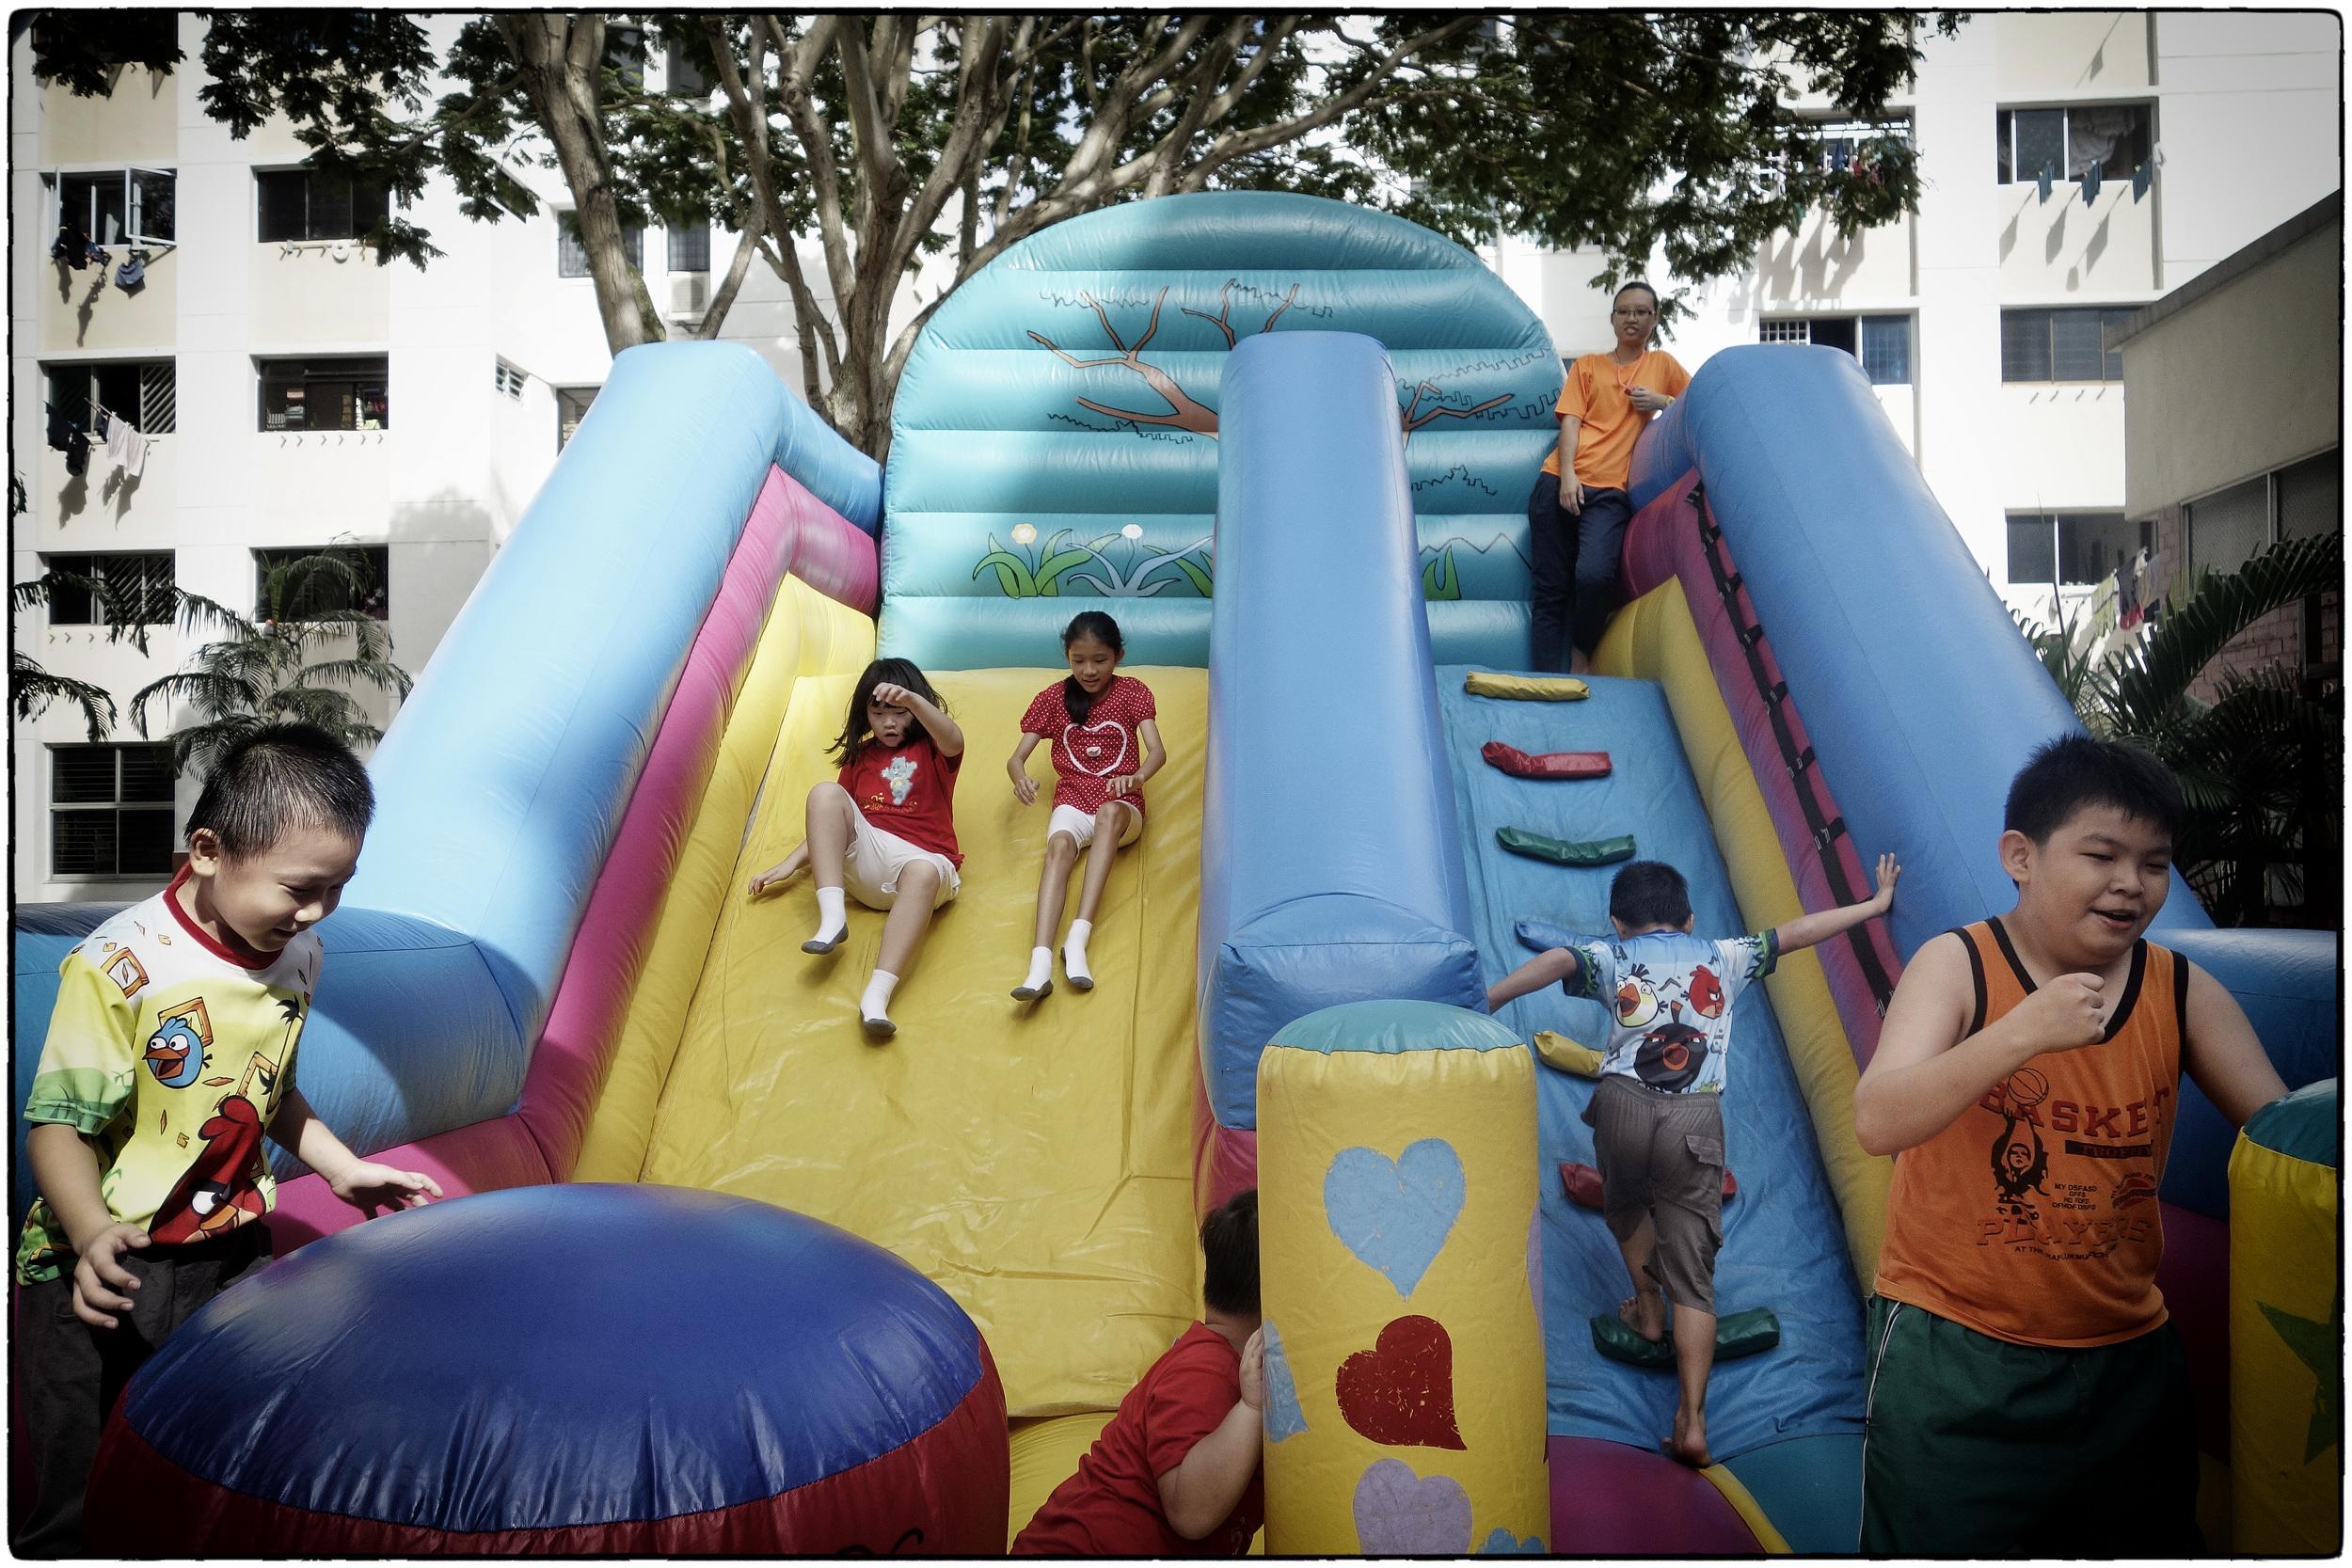 Bouncy slide fun in Serangoon Central.